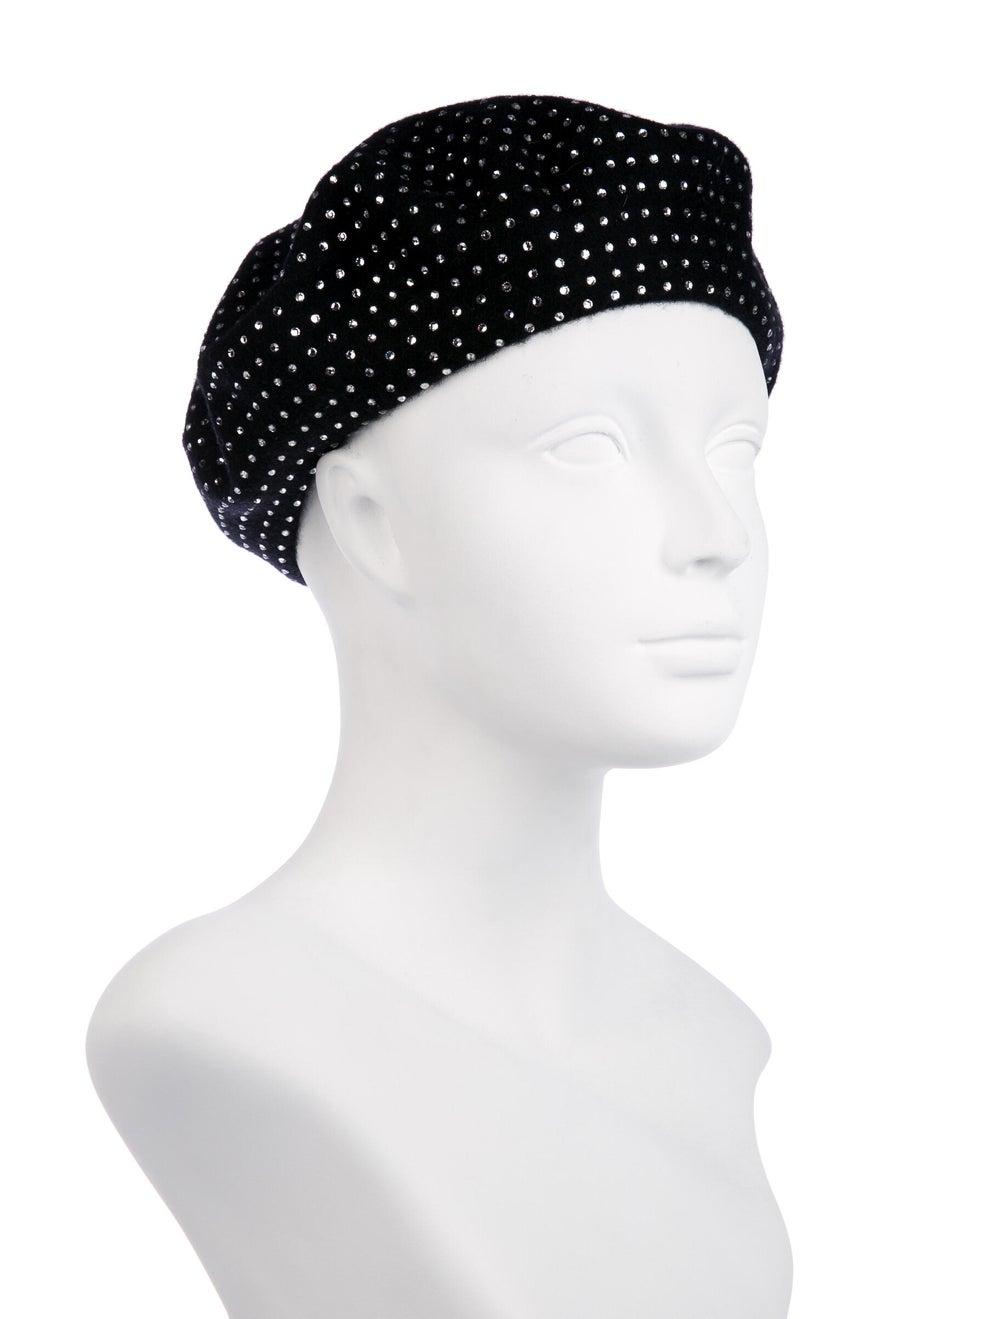 Saint Laurent Strass Wool Beret w/ Tags Black - image 3